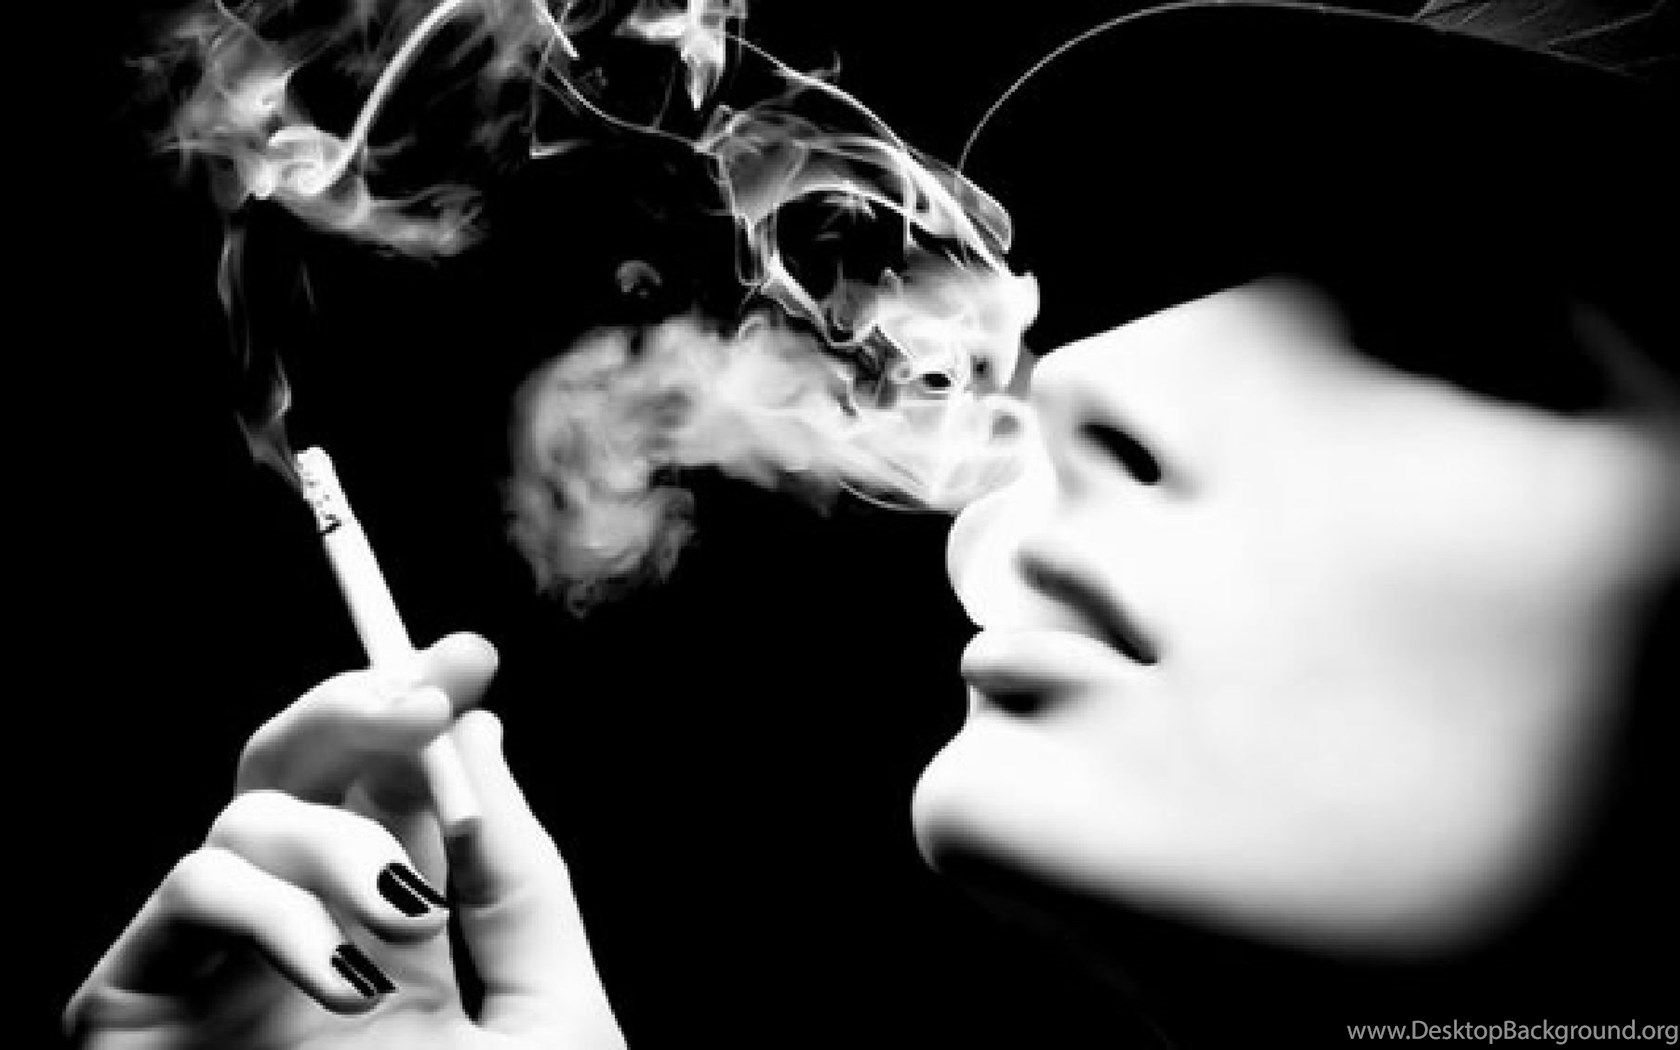 Boy Smoke Wallpapers Top Free Boy Smoke Backgrounds Wallpaperaccess